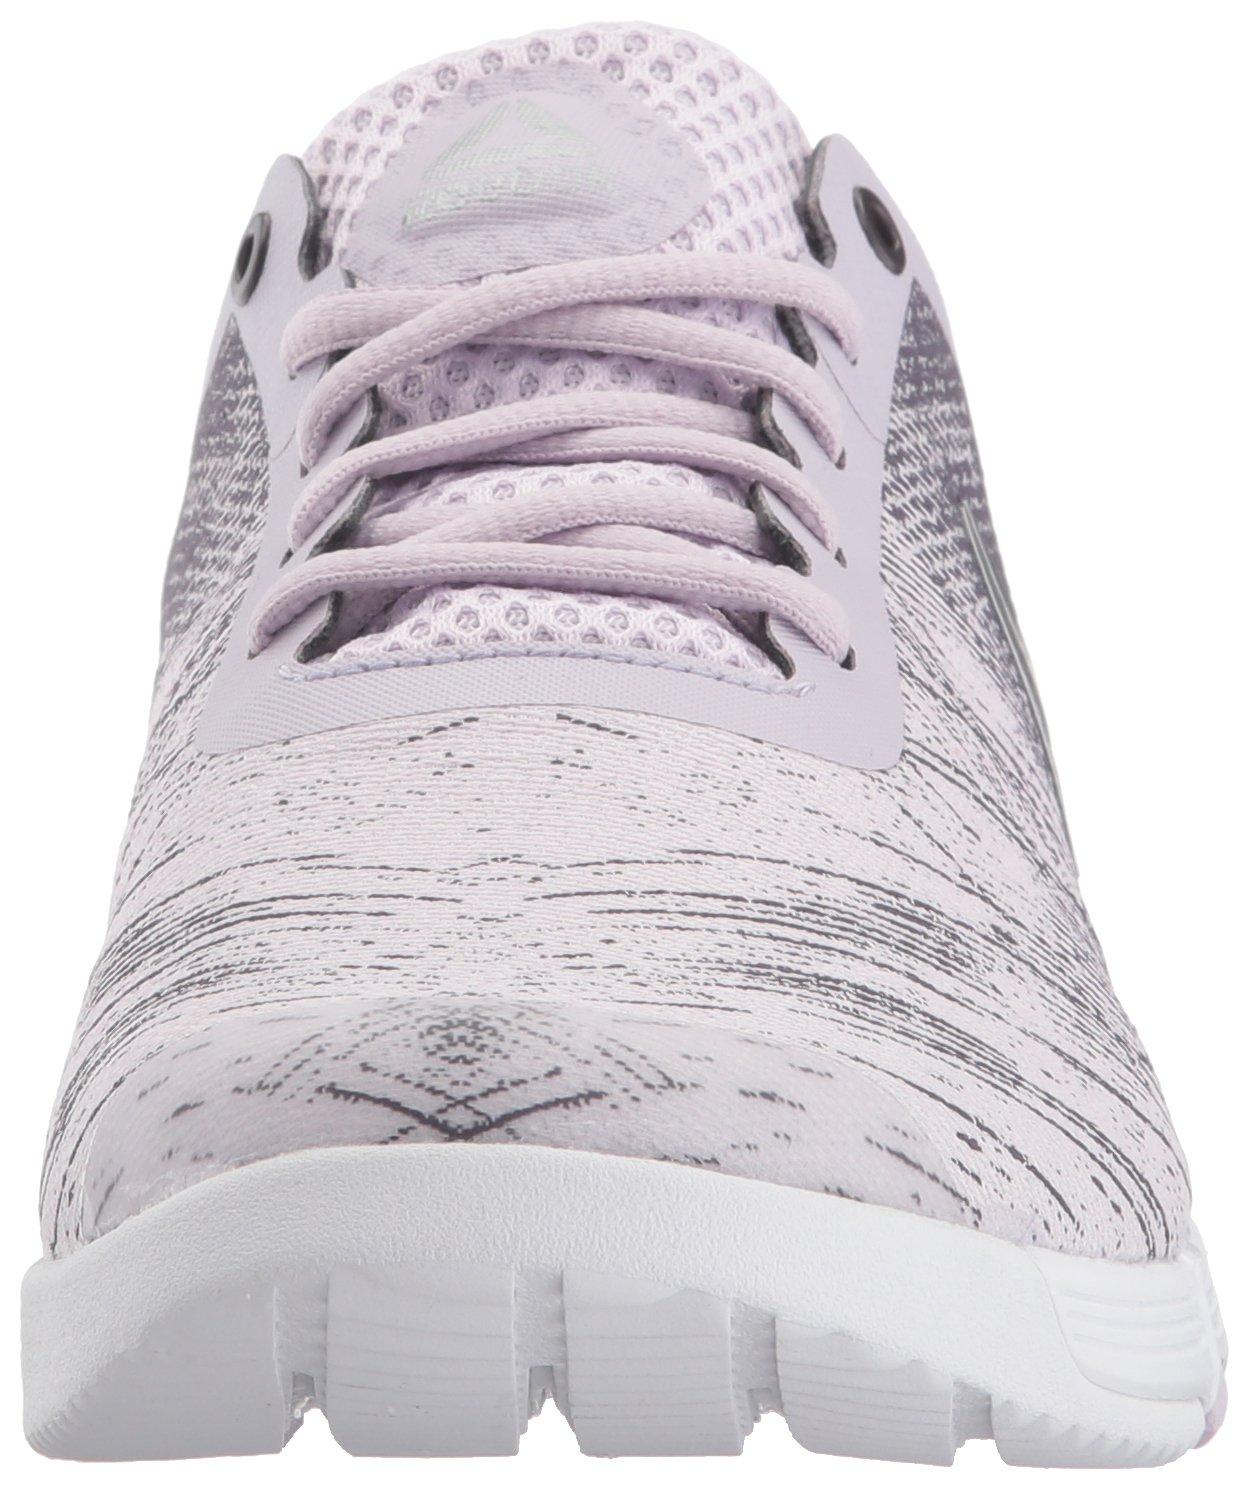 7a11fb4bd7c2 ... Reebok B073XK6238 Women s Speed Her TR Sneaker B073XK6238 Reebok 5.5  B(M) US